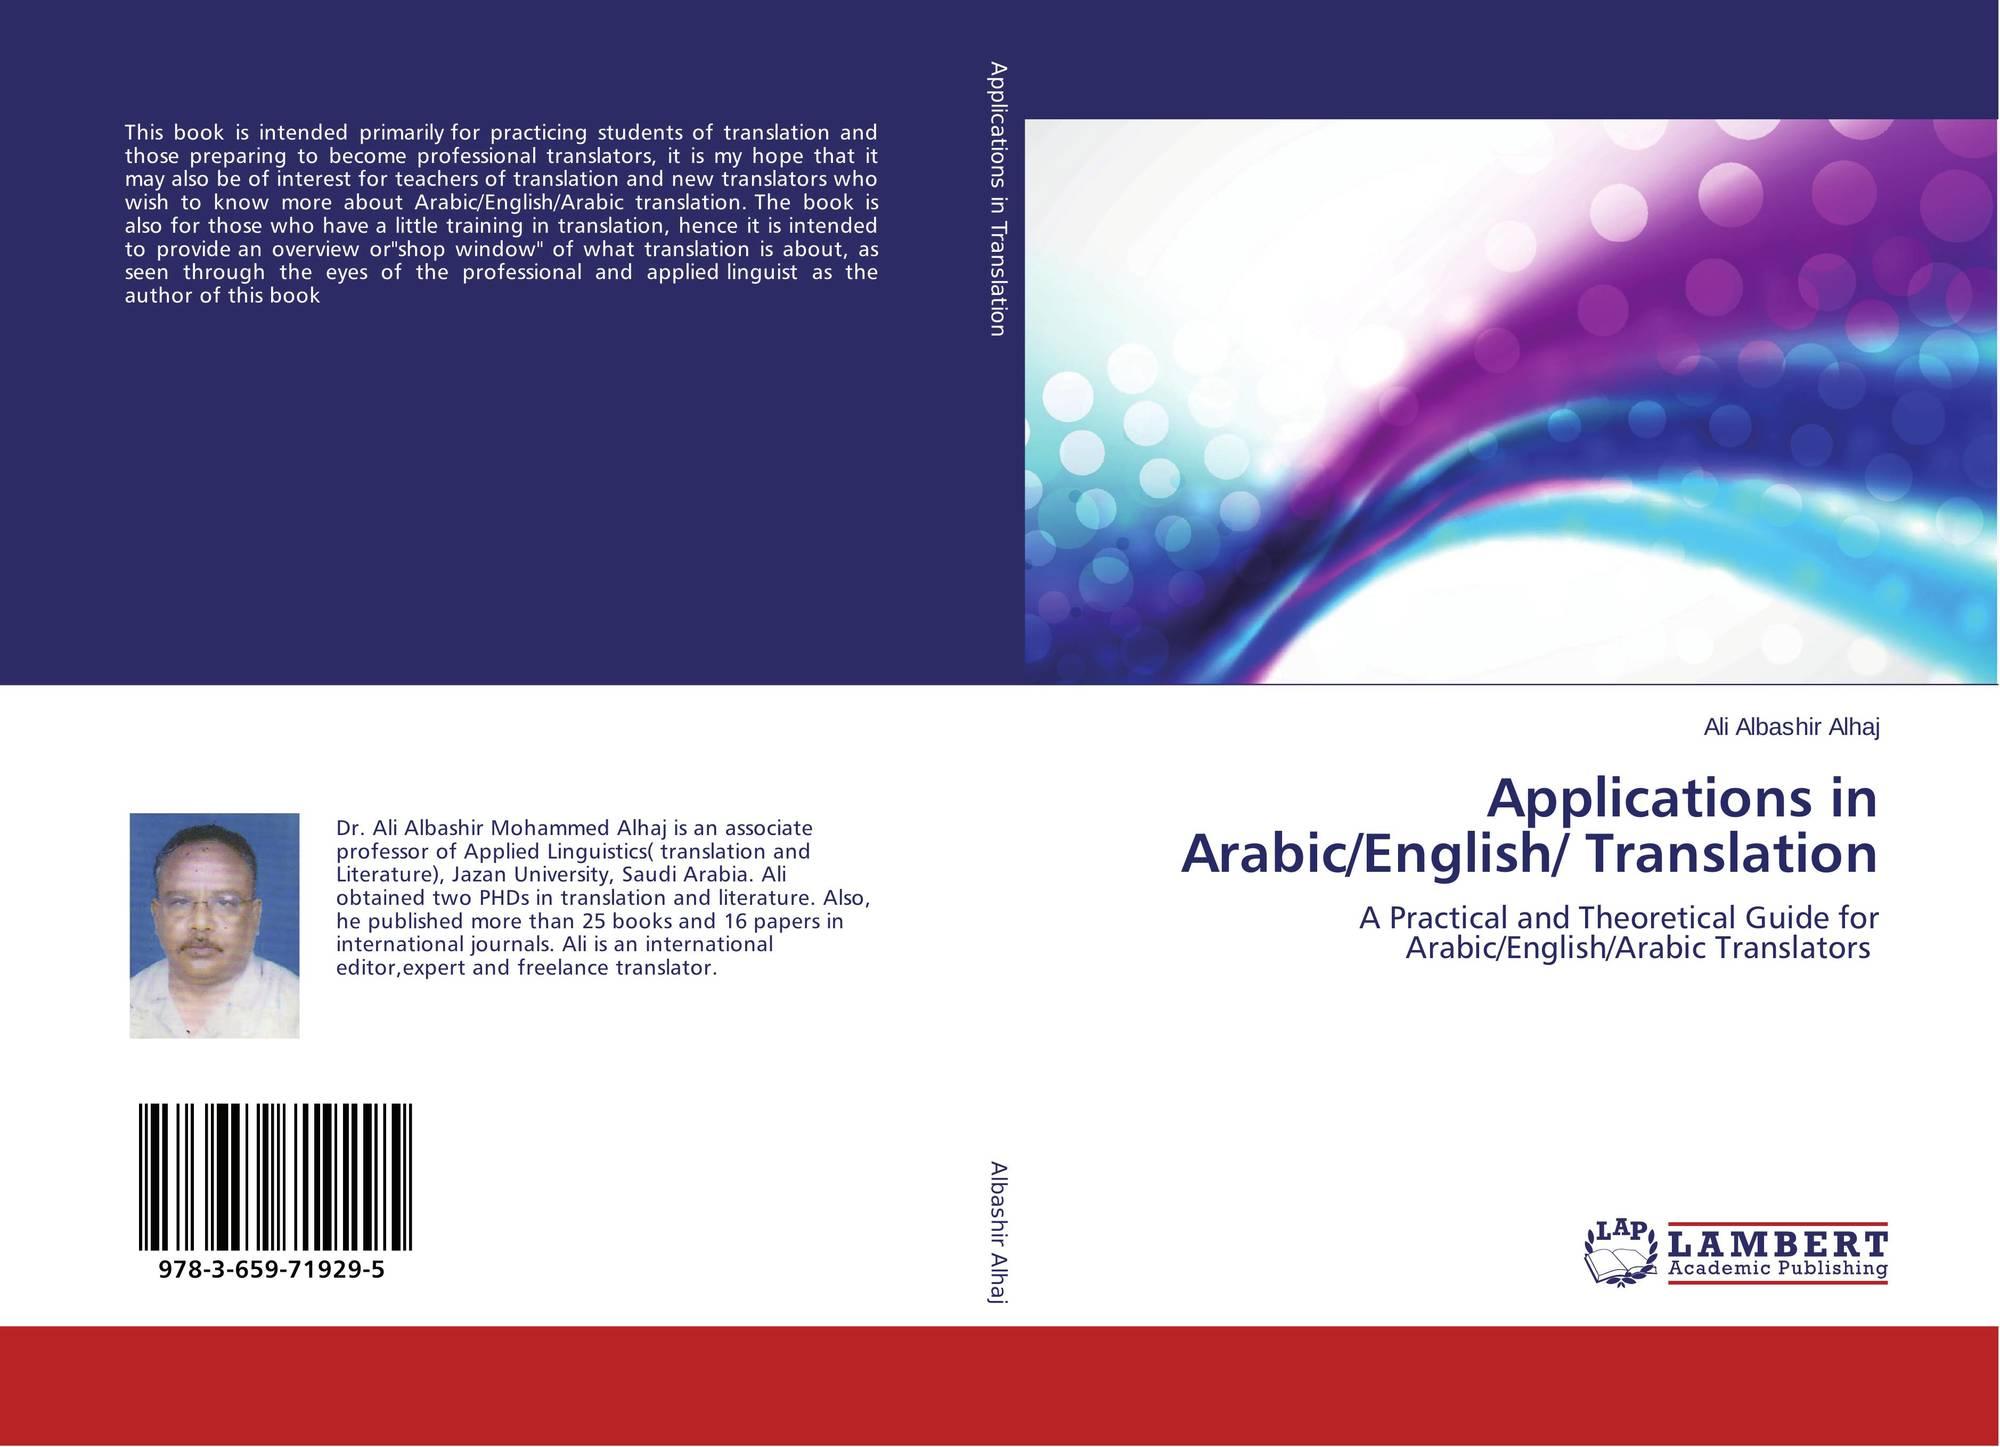 Applications in Arabic/English/ Translation, 978-3-659-71929